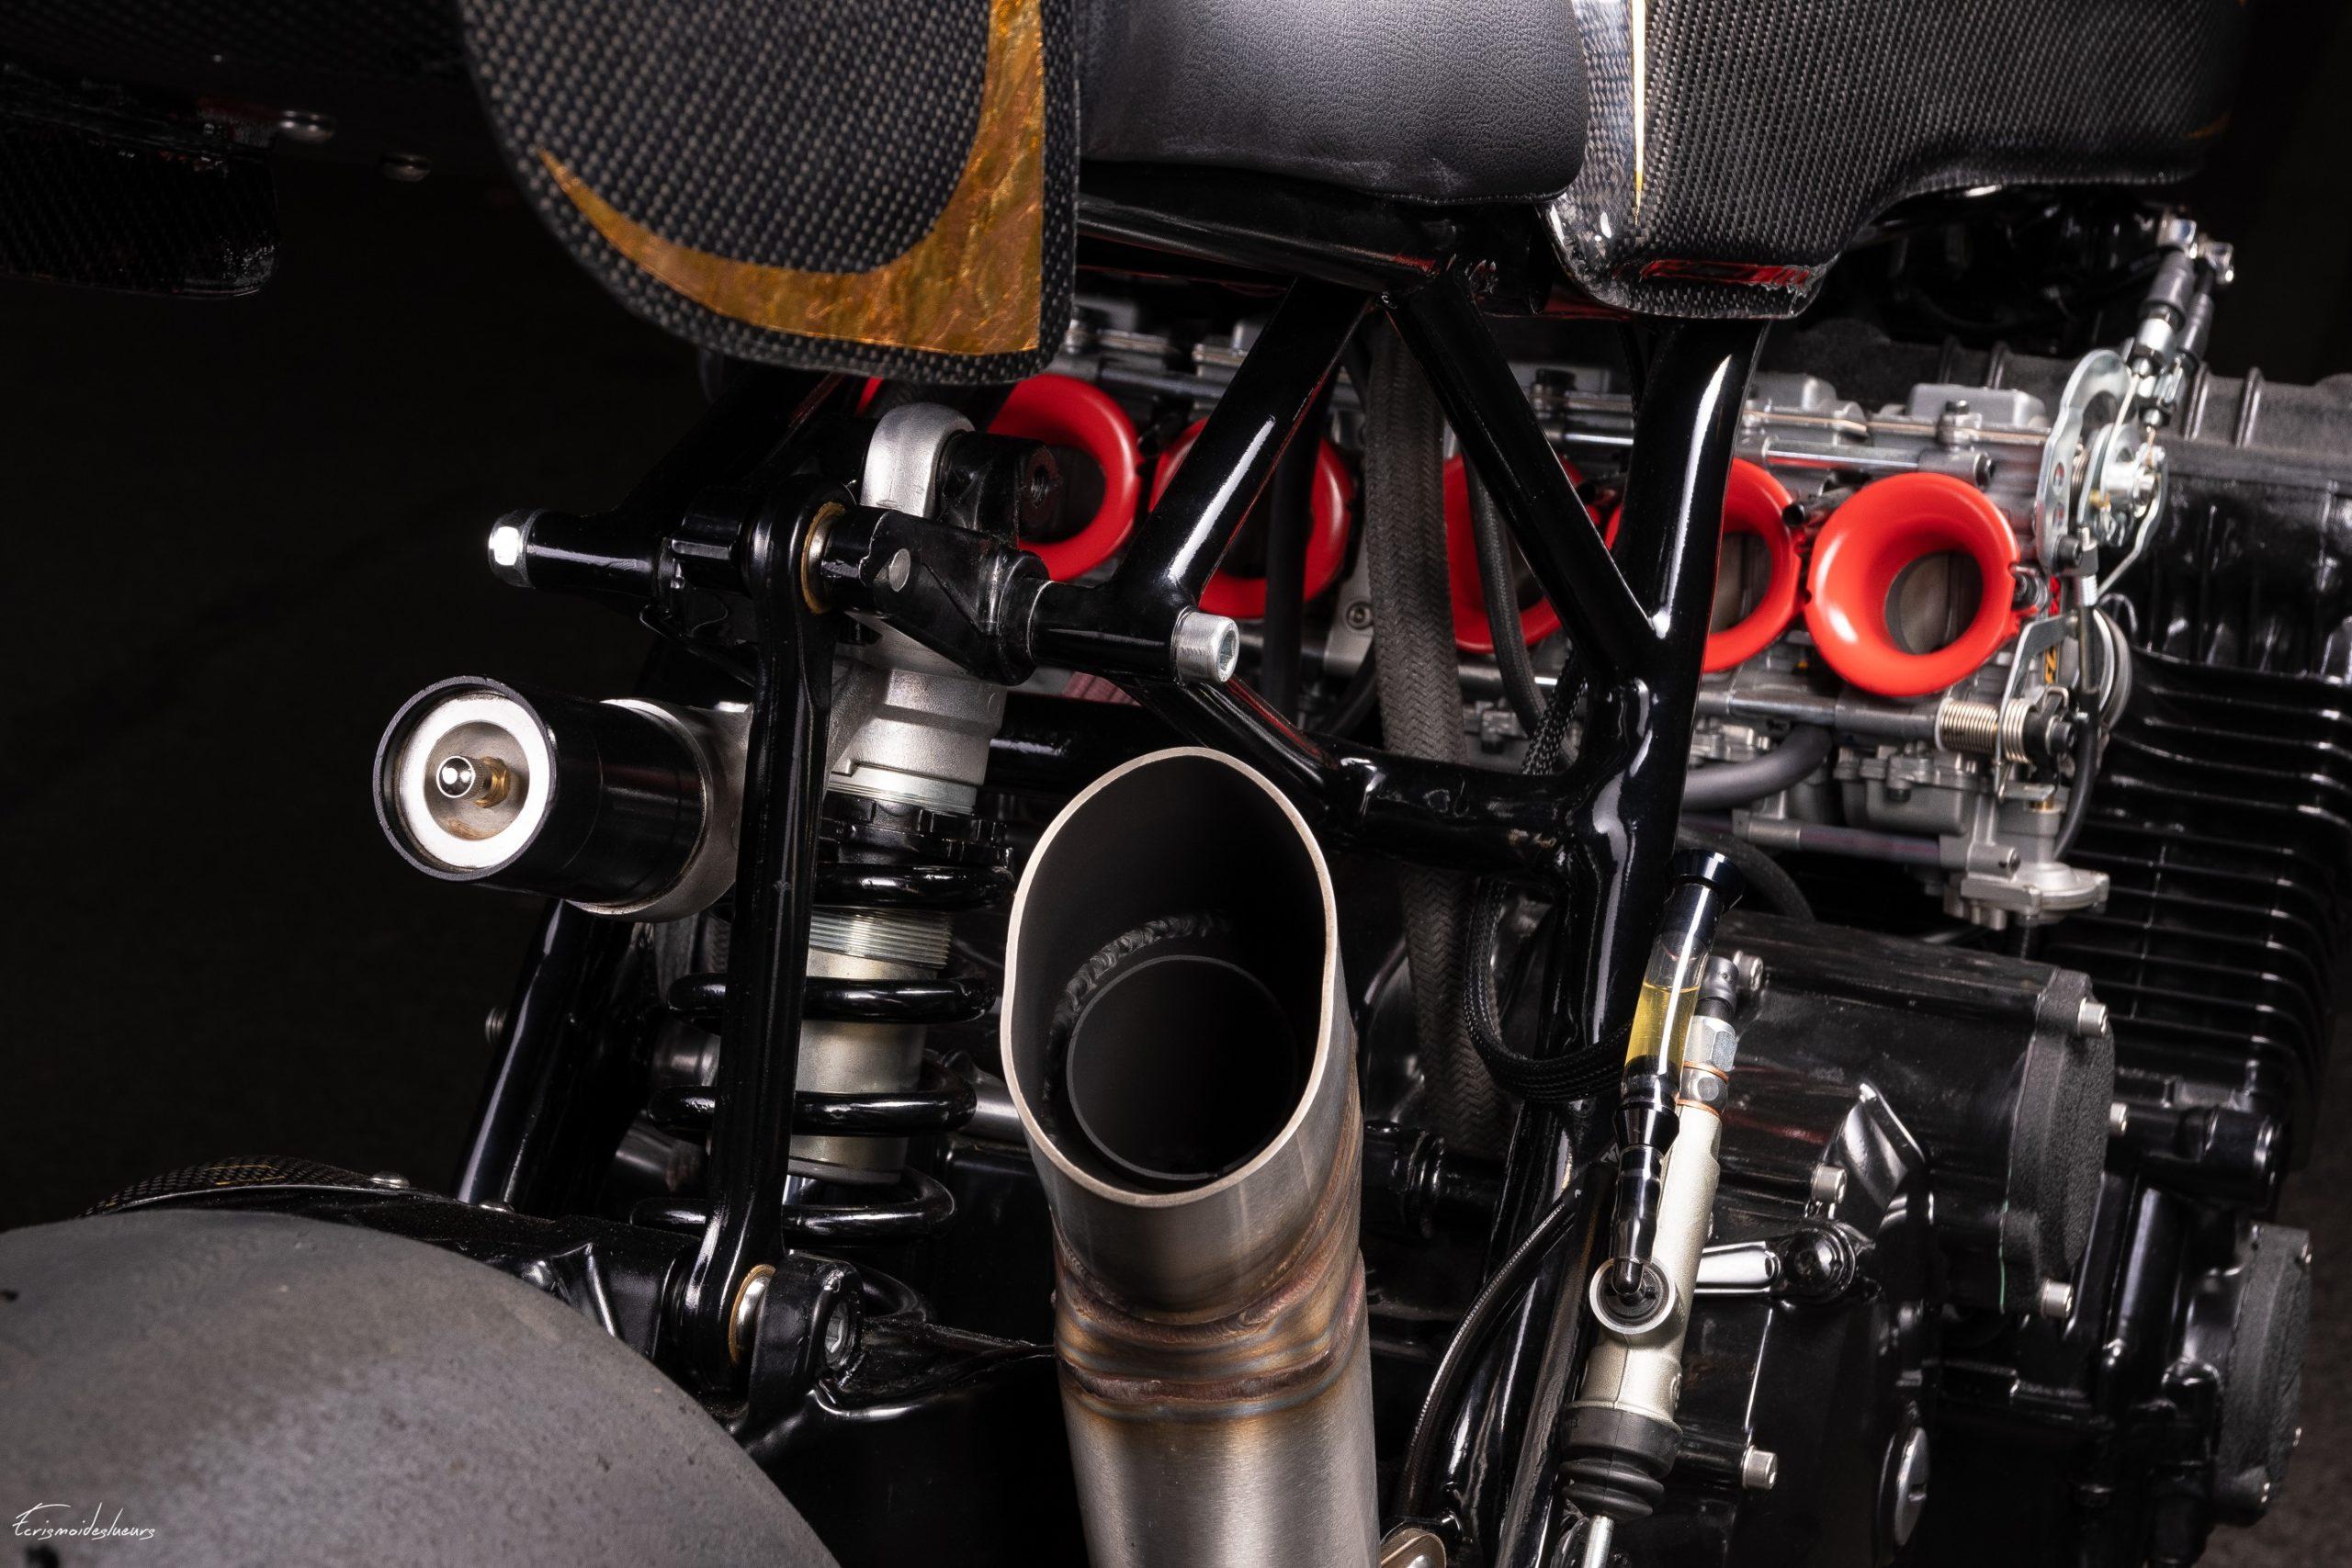 honda cafe racer CBX 1000 lys motorycles